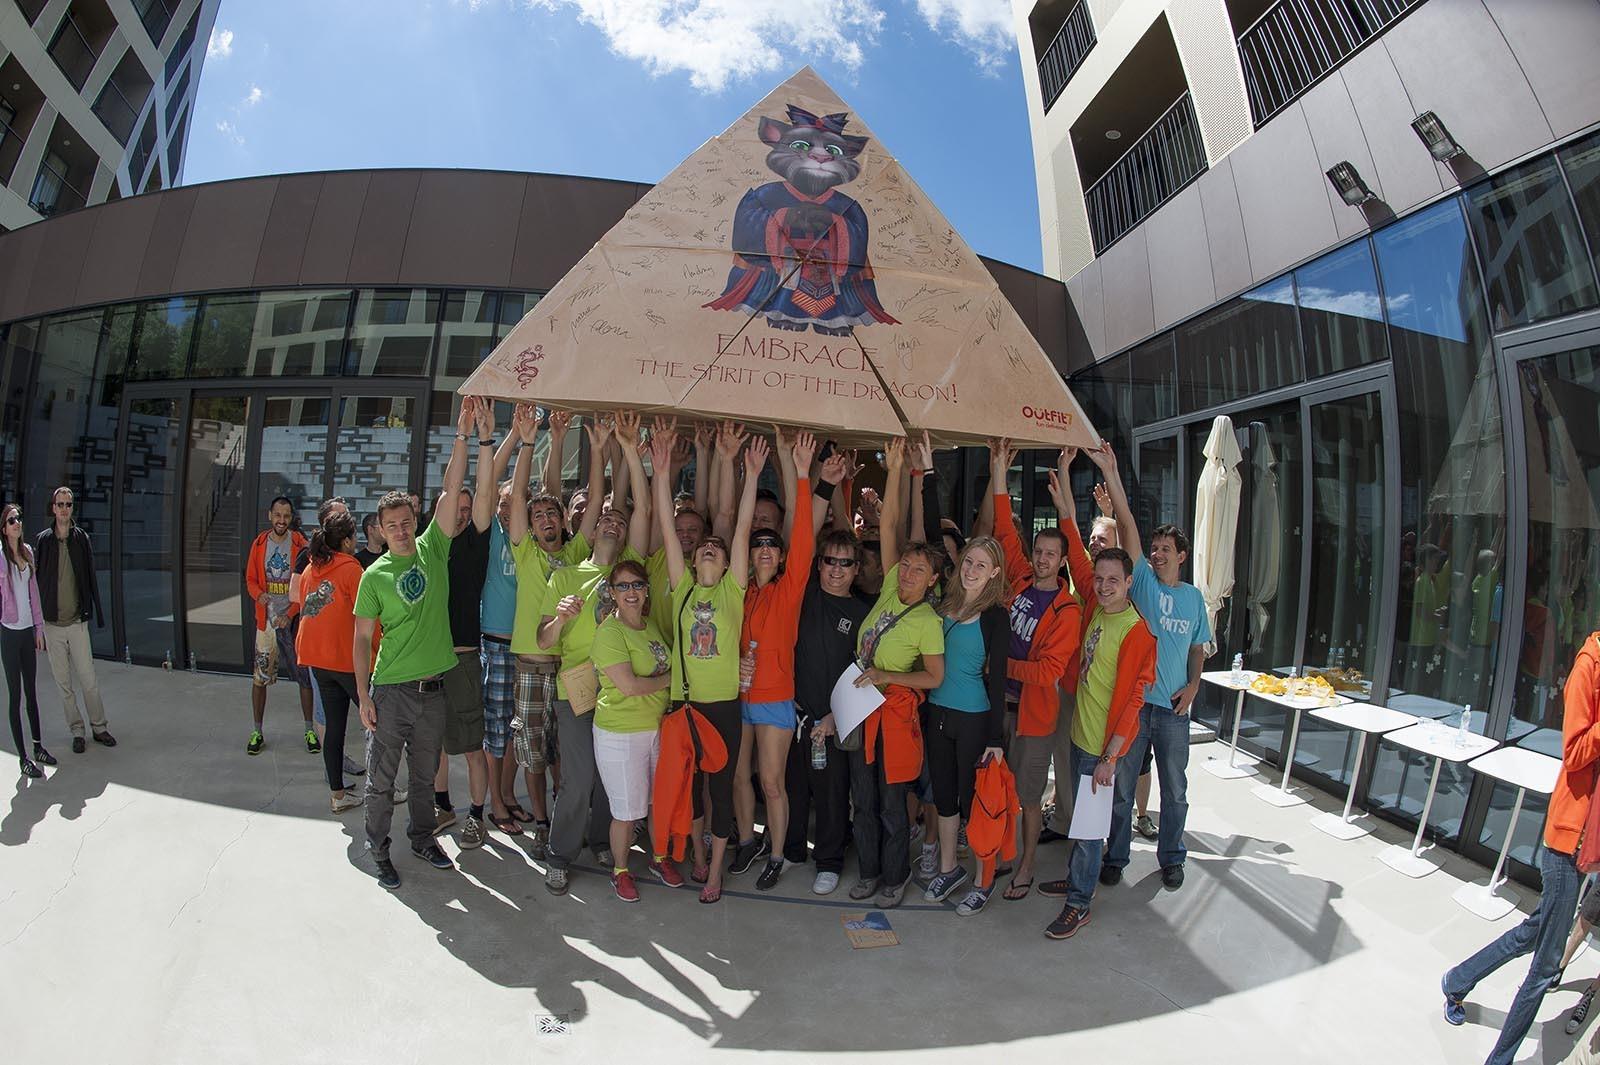 Na konci staveni se teamy foti s pyramidou, kterou dohromady vytvorili pri aktivite Flat Out Pyramids